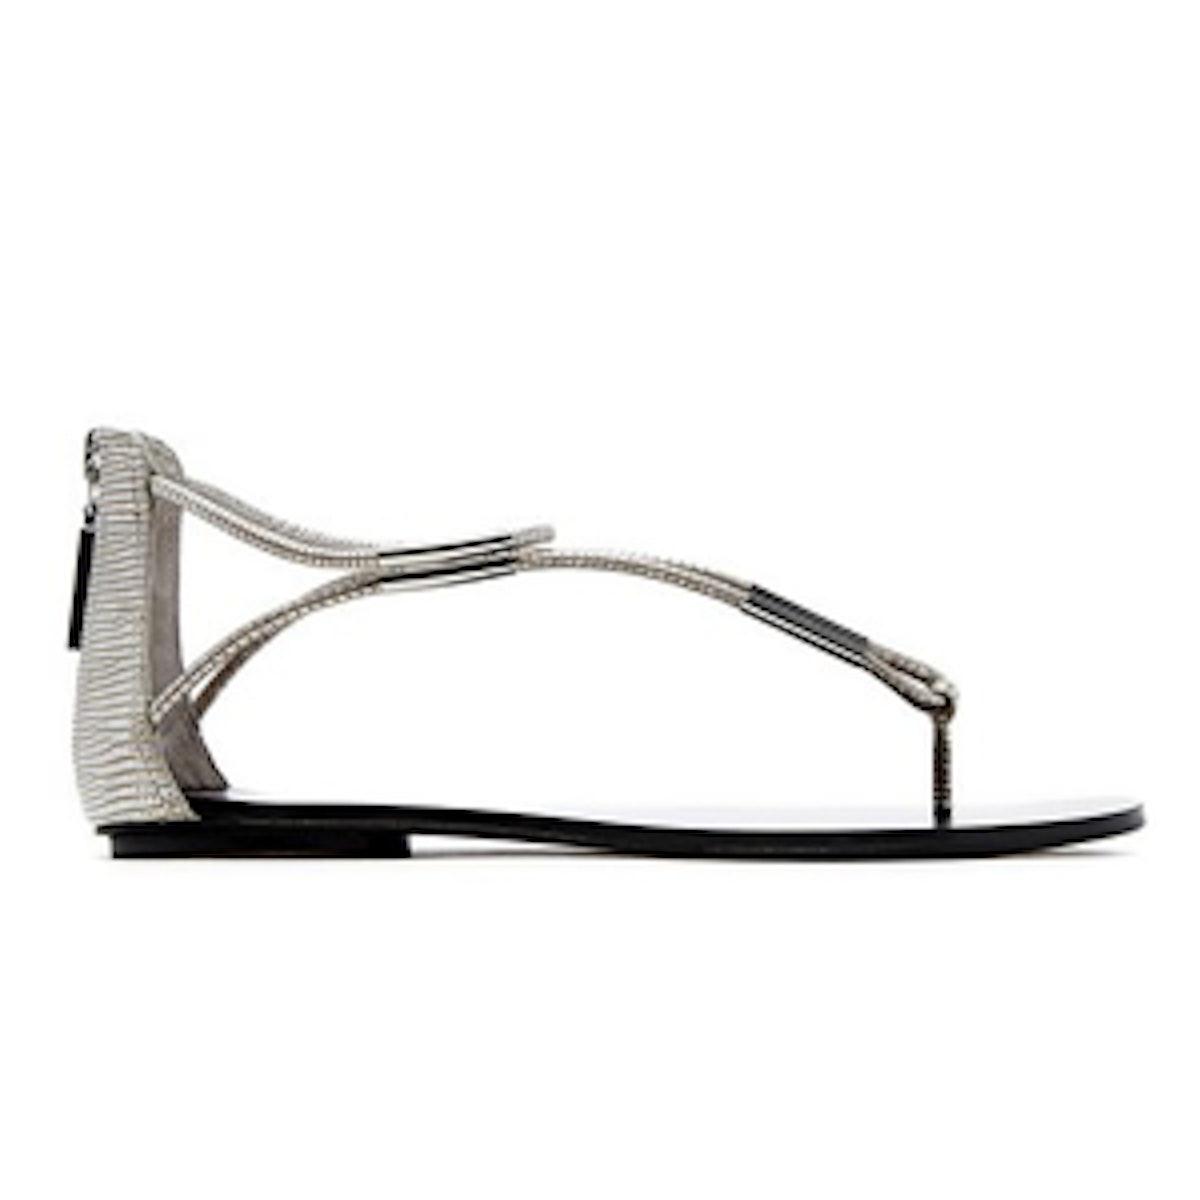 Marni Sandals in Silver